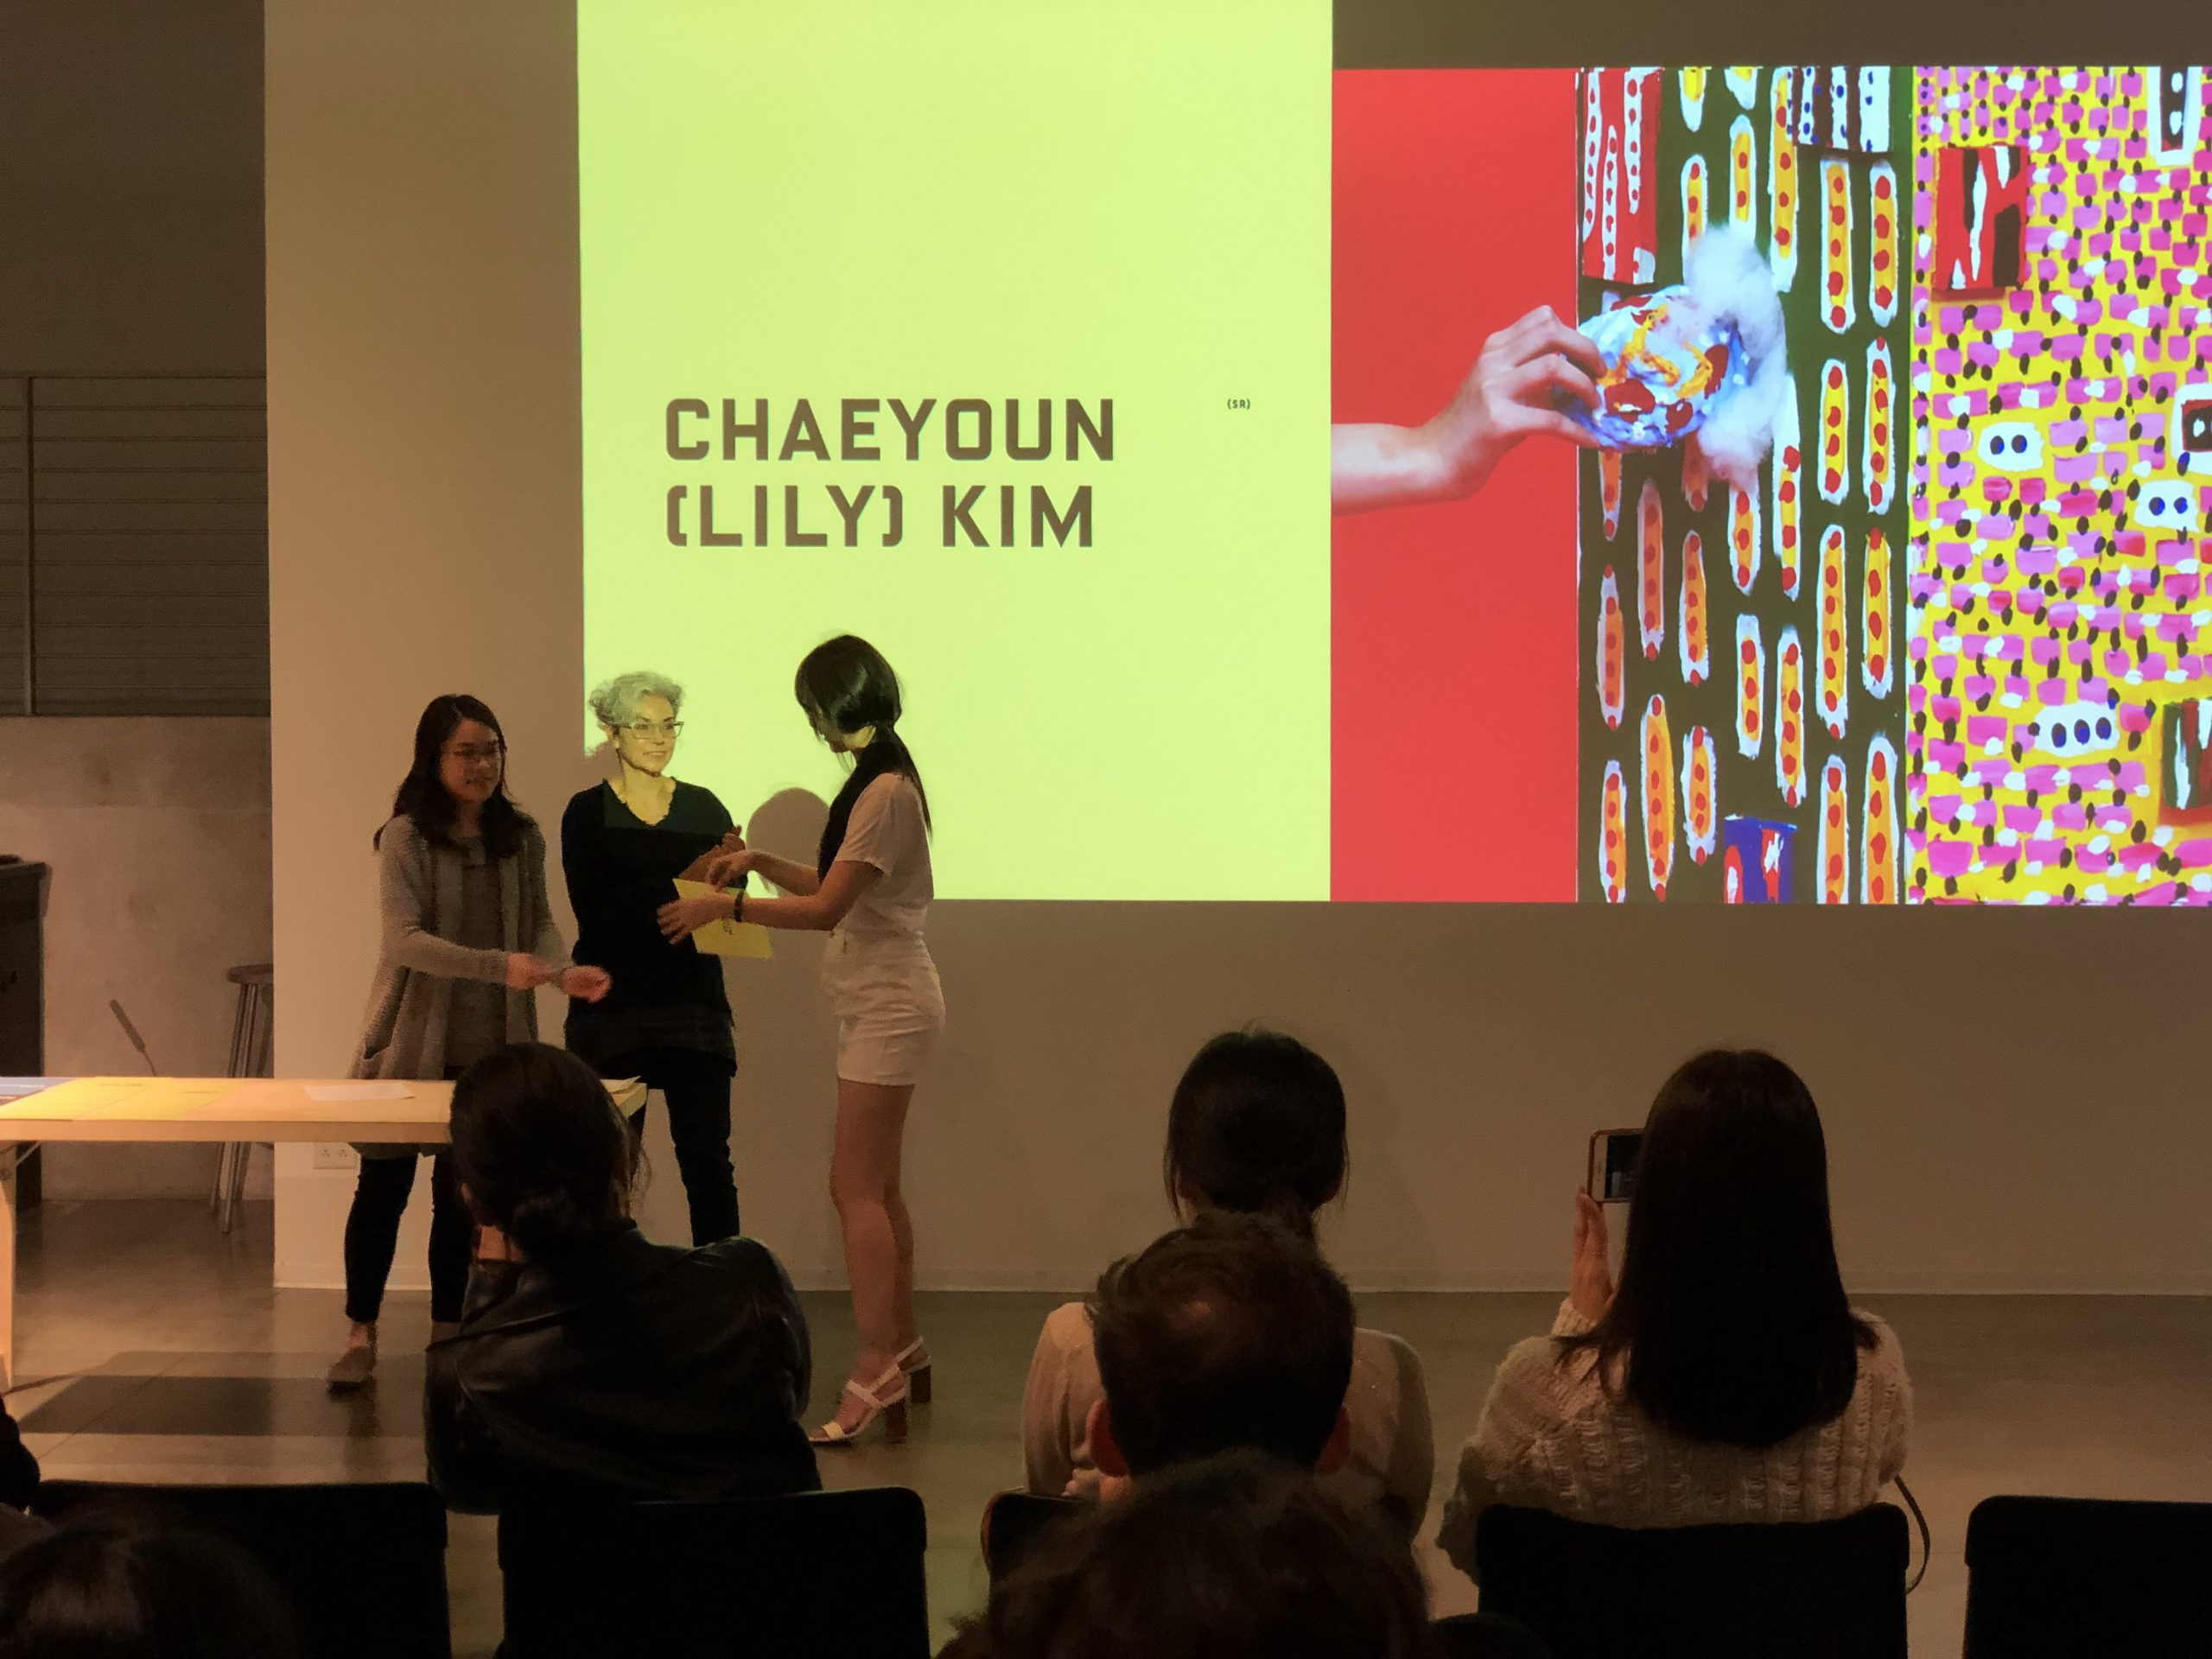 DMA Scholarship Reception 2019-2020, Chaeyoun [Lily] Kim